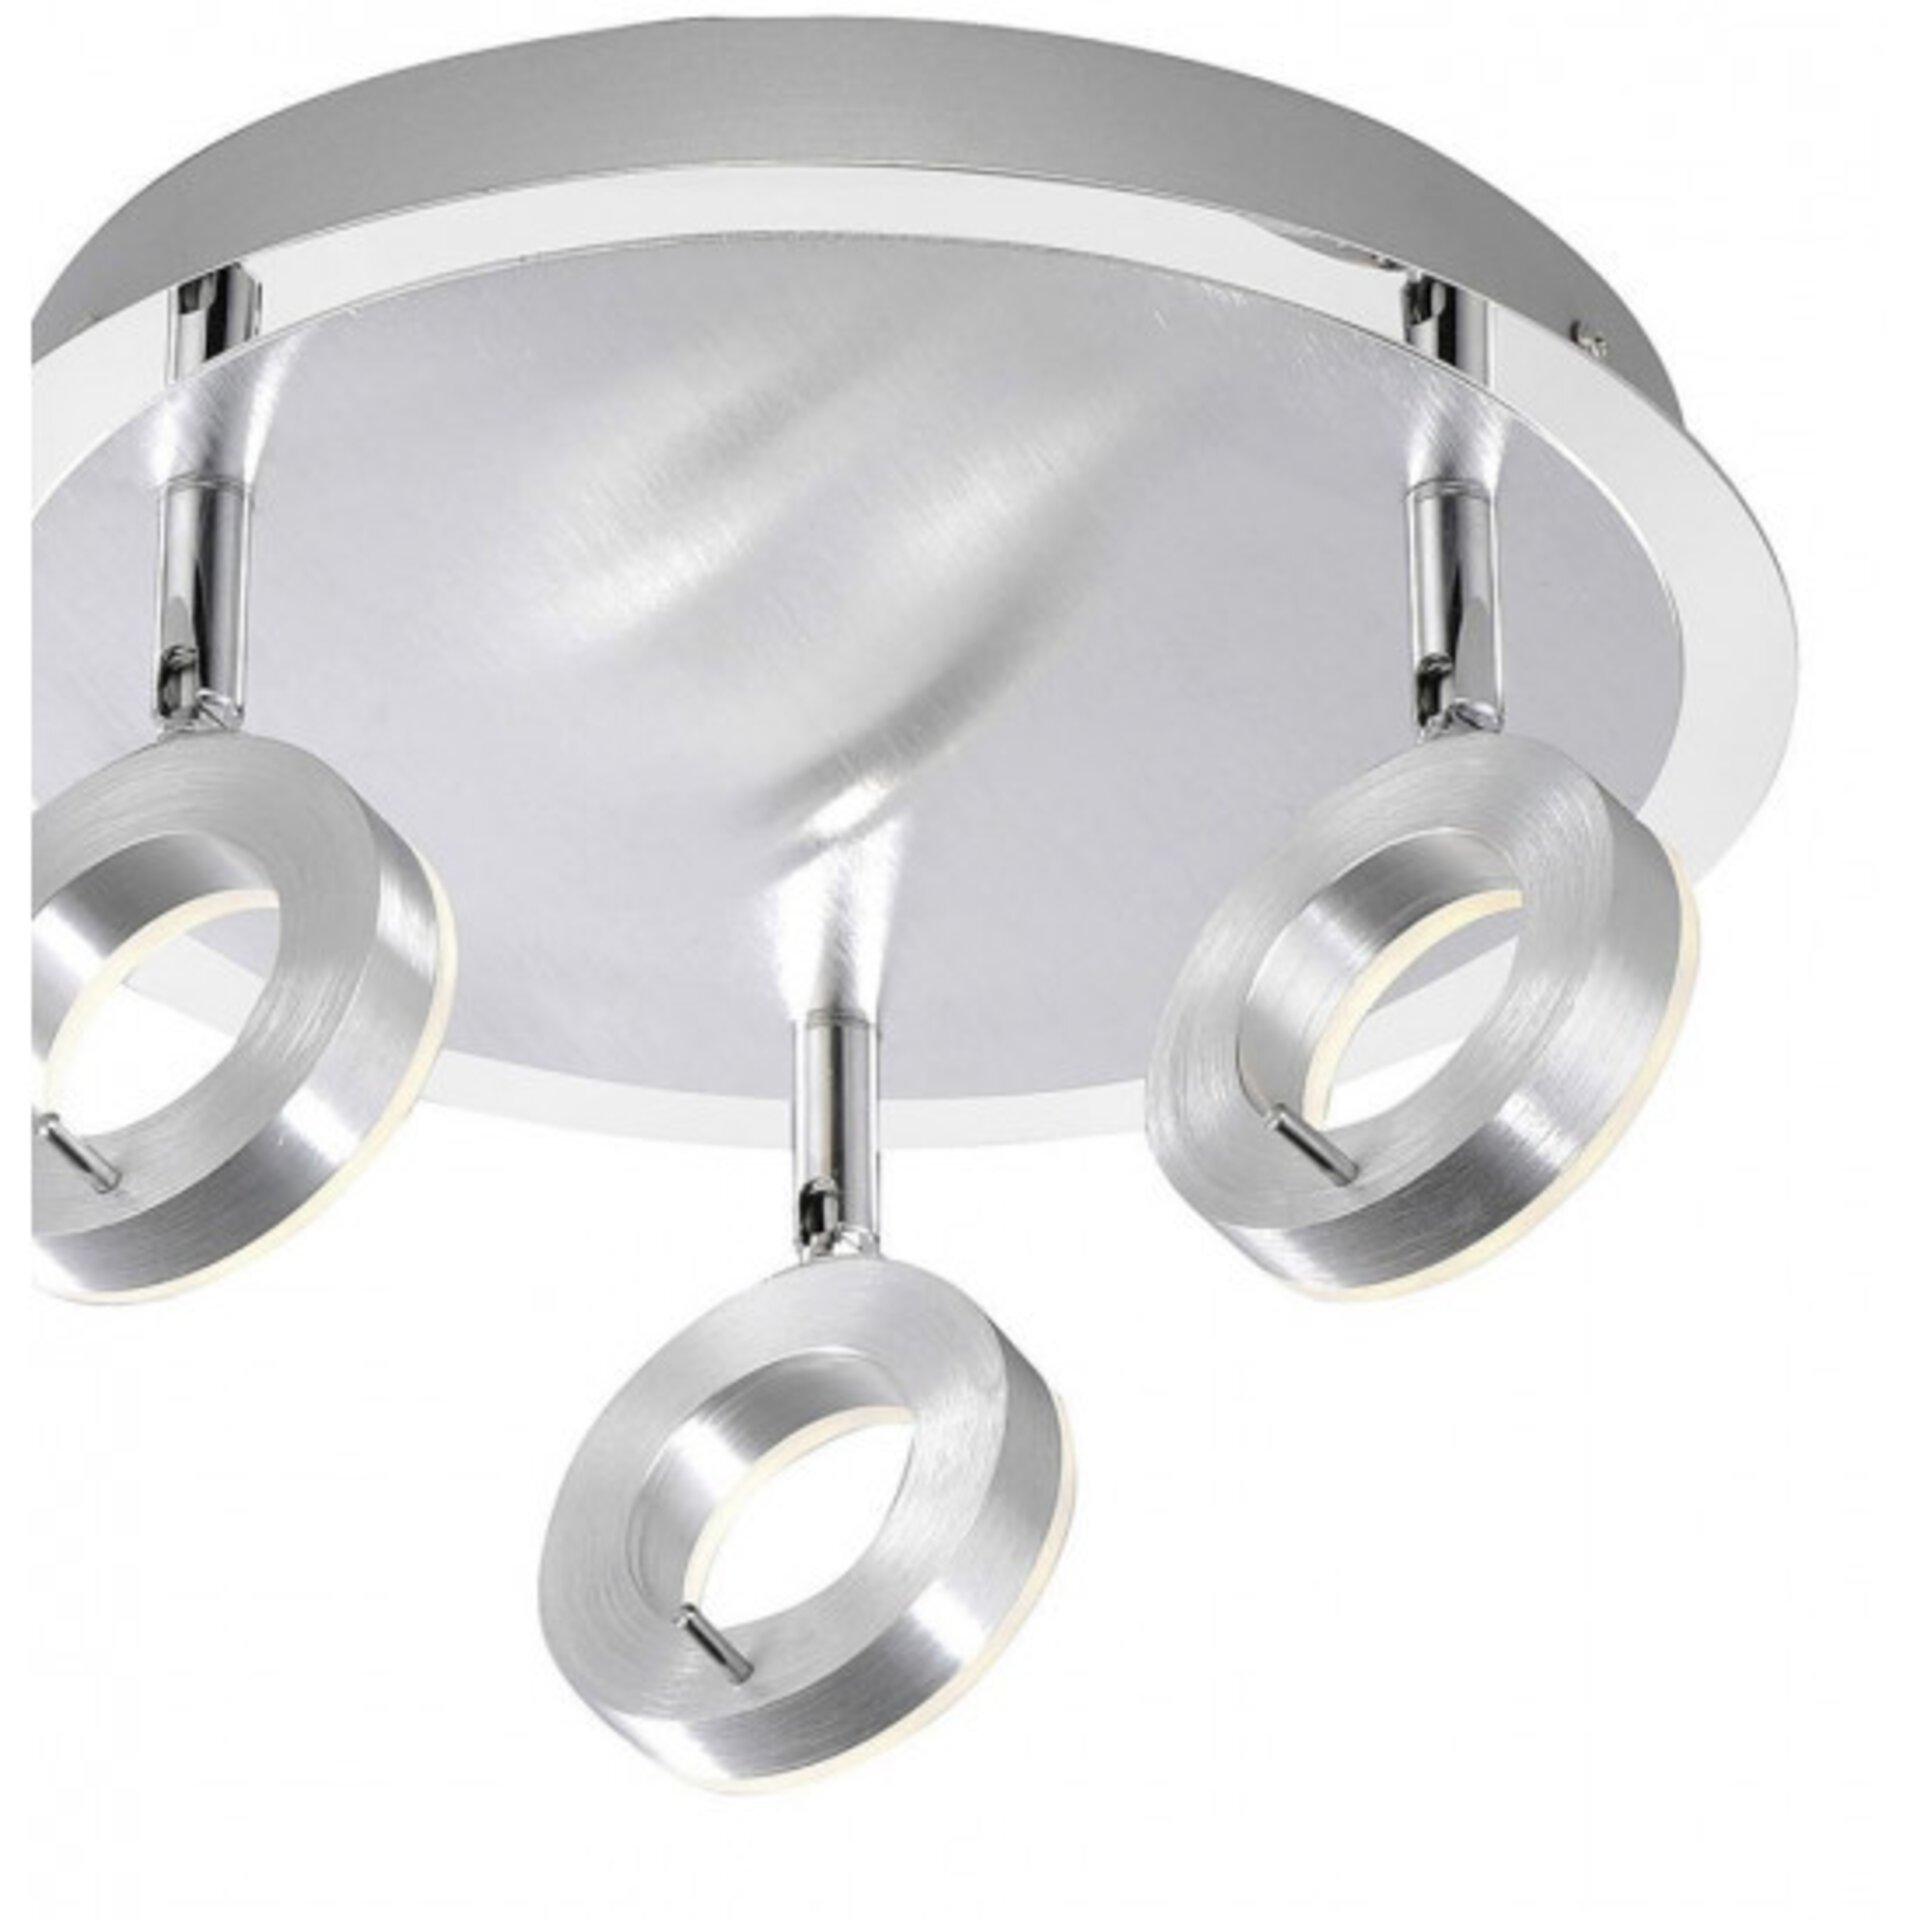 Deckenleuchte SILEDA Paul Neuhaus Metall silber 34 x 17 x 34 cm